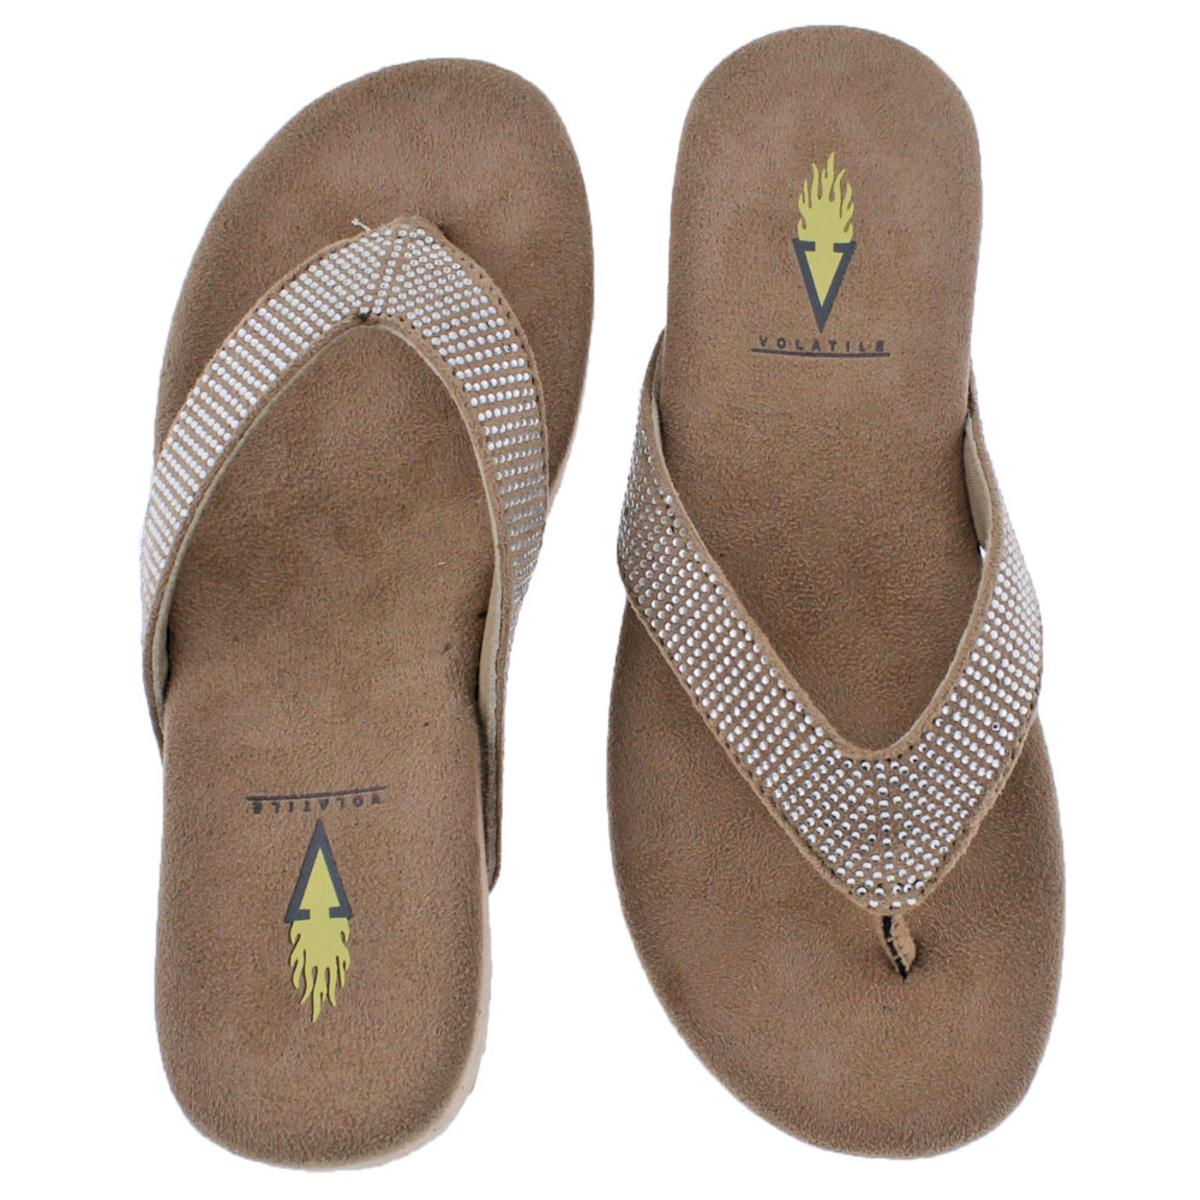 af9be612f3 Volatile Jania Wedge Rhinestone Women s Flip Flop Wedge Sandals